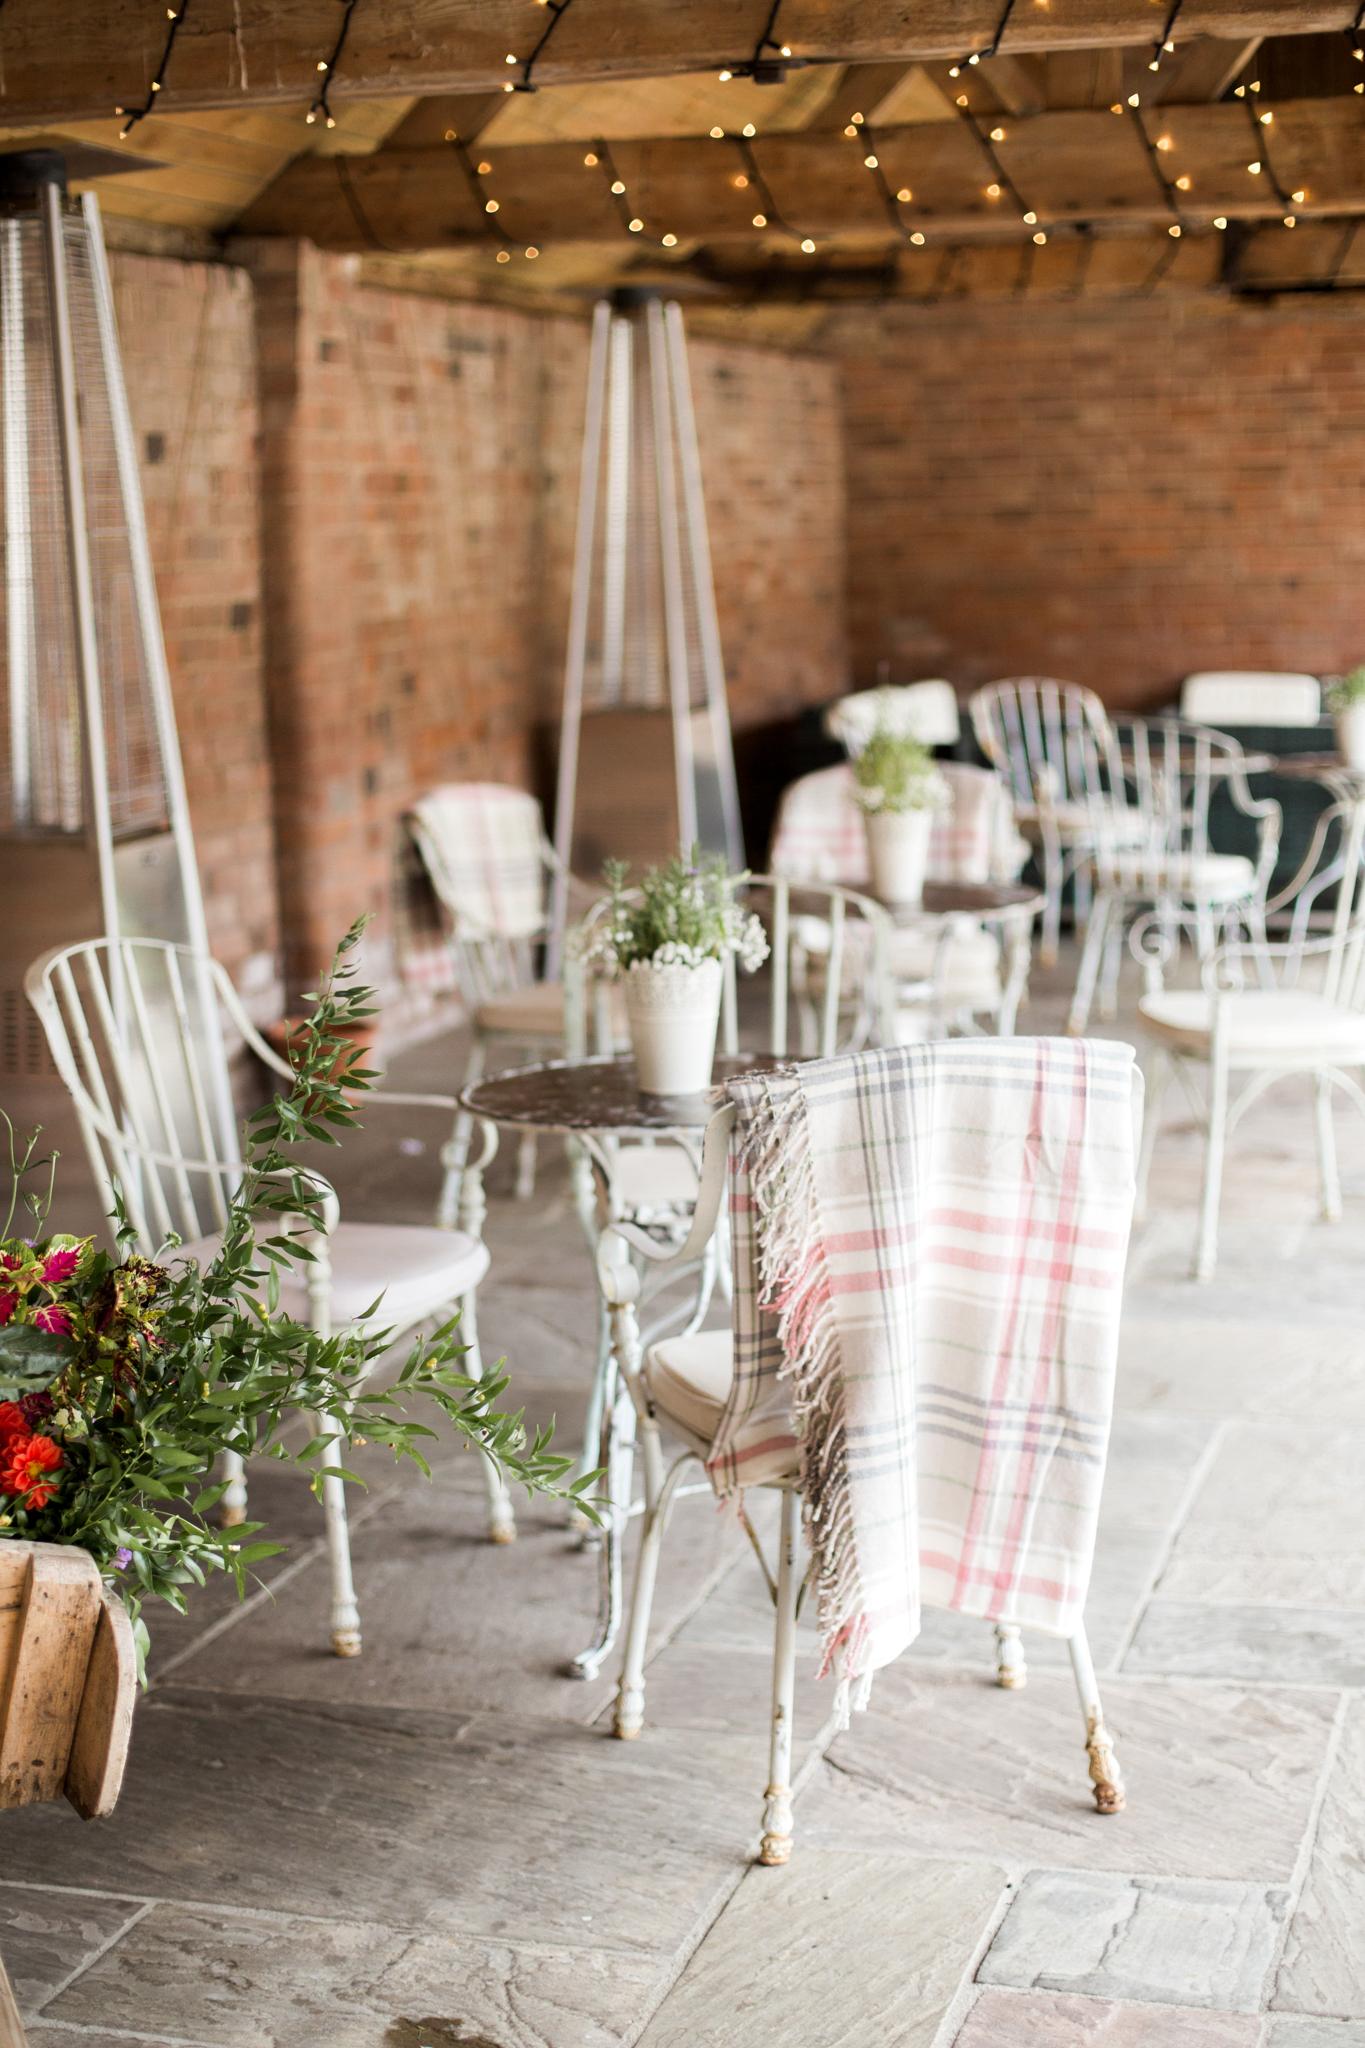 Rowsie & Lee, Swallows Nest Barn Wedding, Cotswold wedding photographer, Warwickshire Wedding Photographer-130.jpg